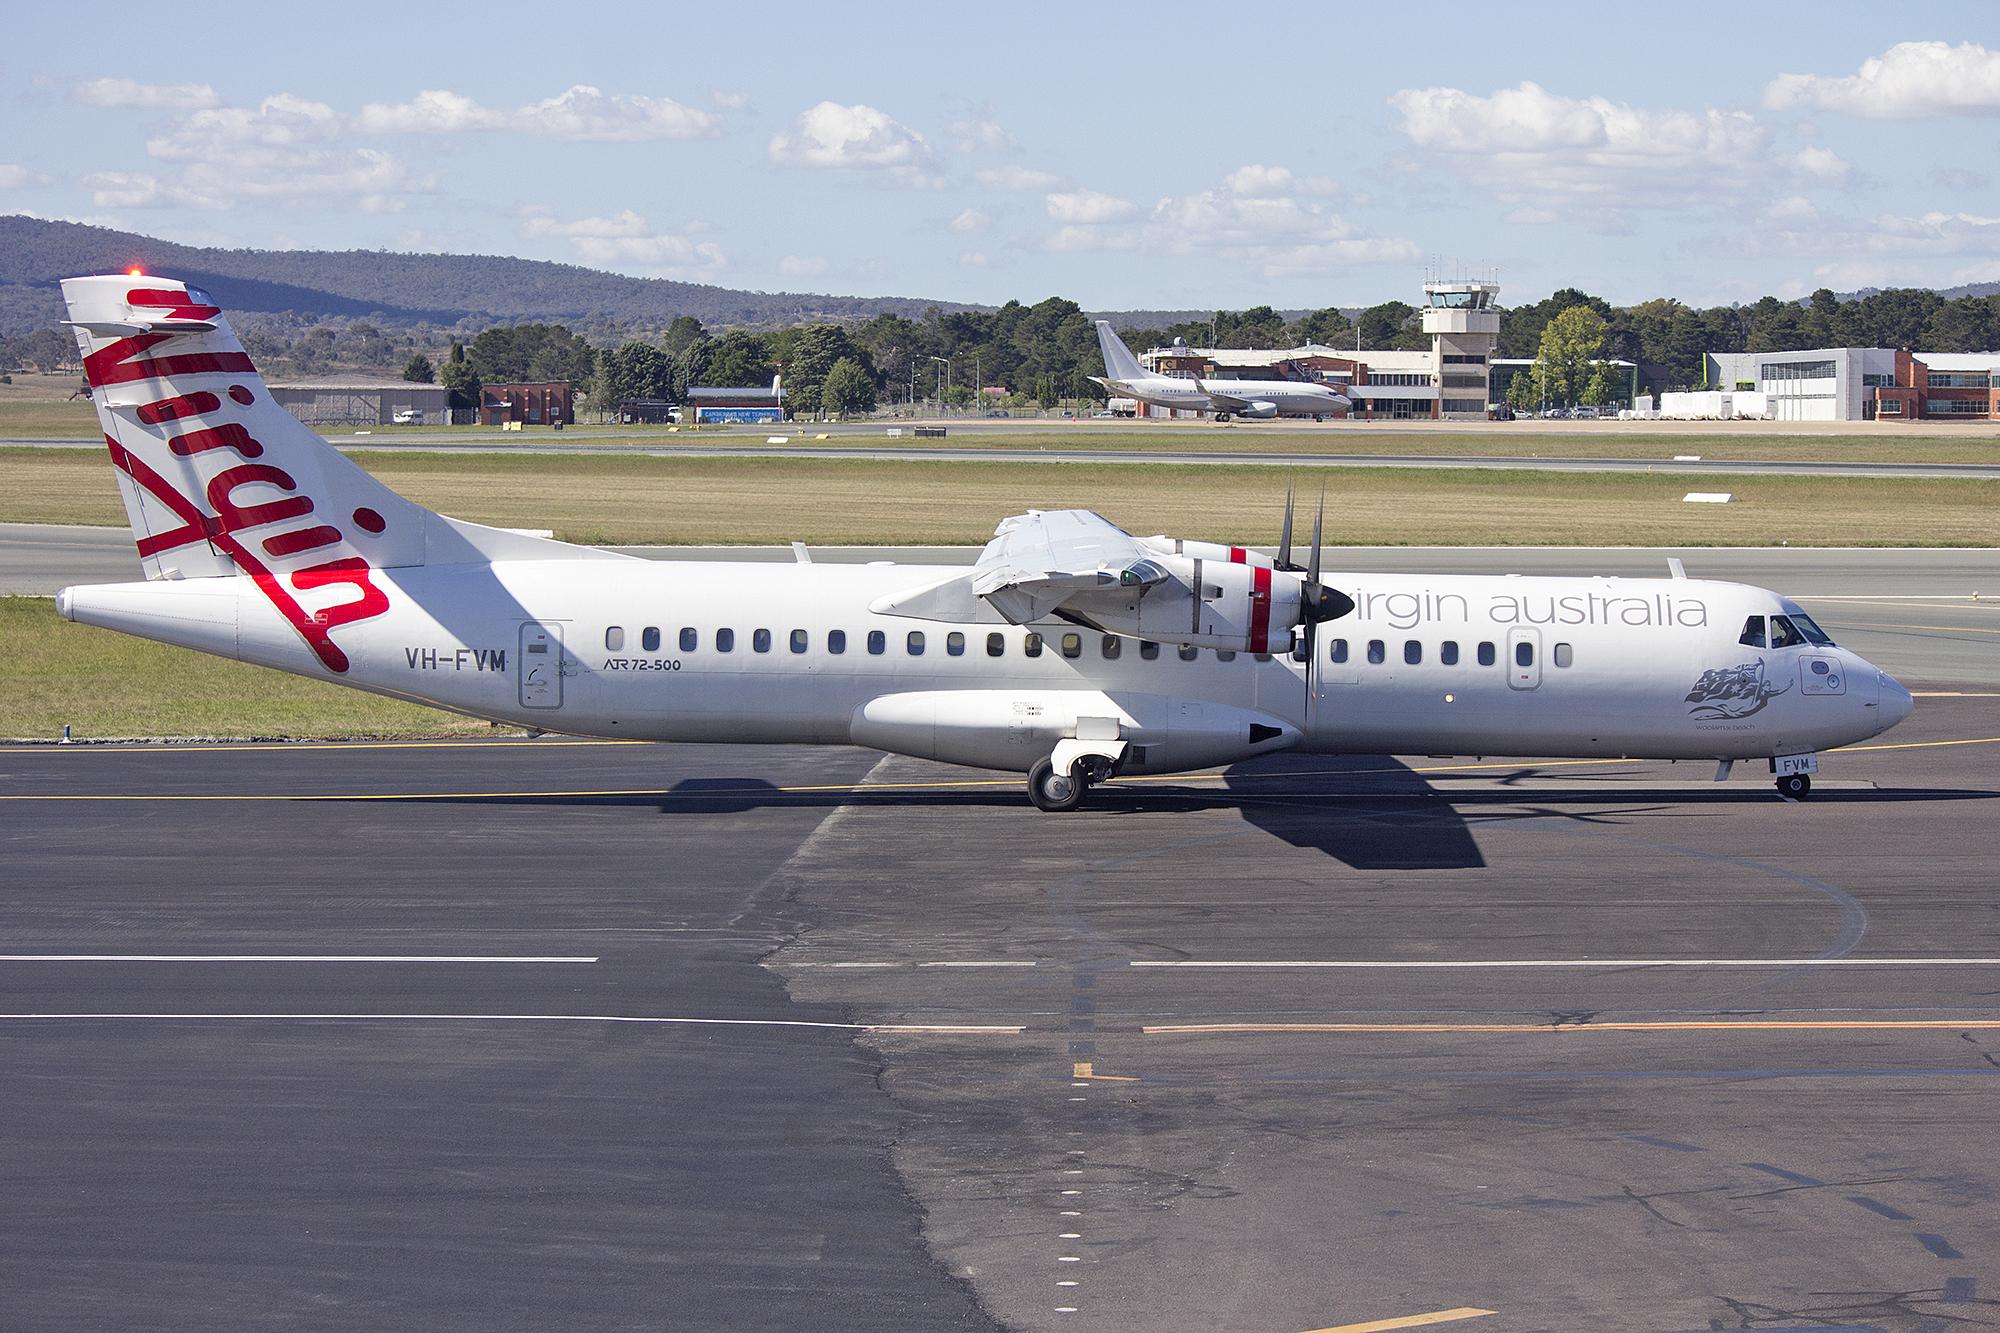 Trip Report: Skywest (Australia) EPR-PER - Wild About Travel